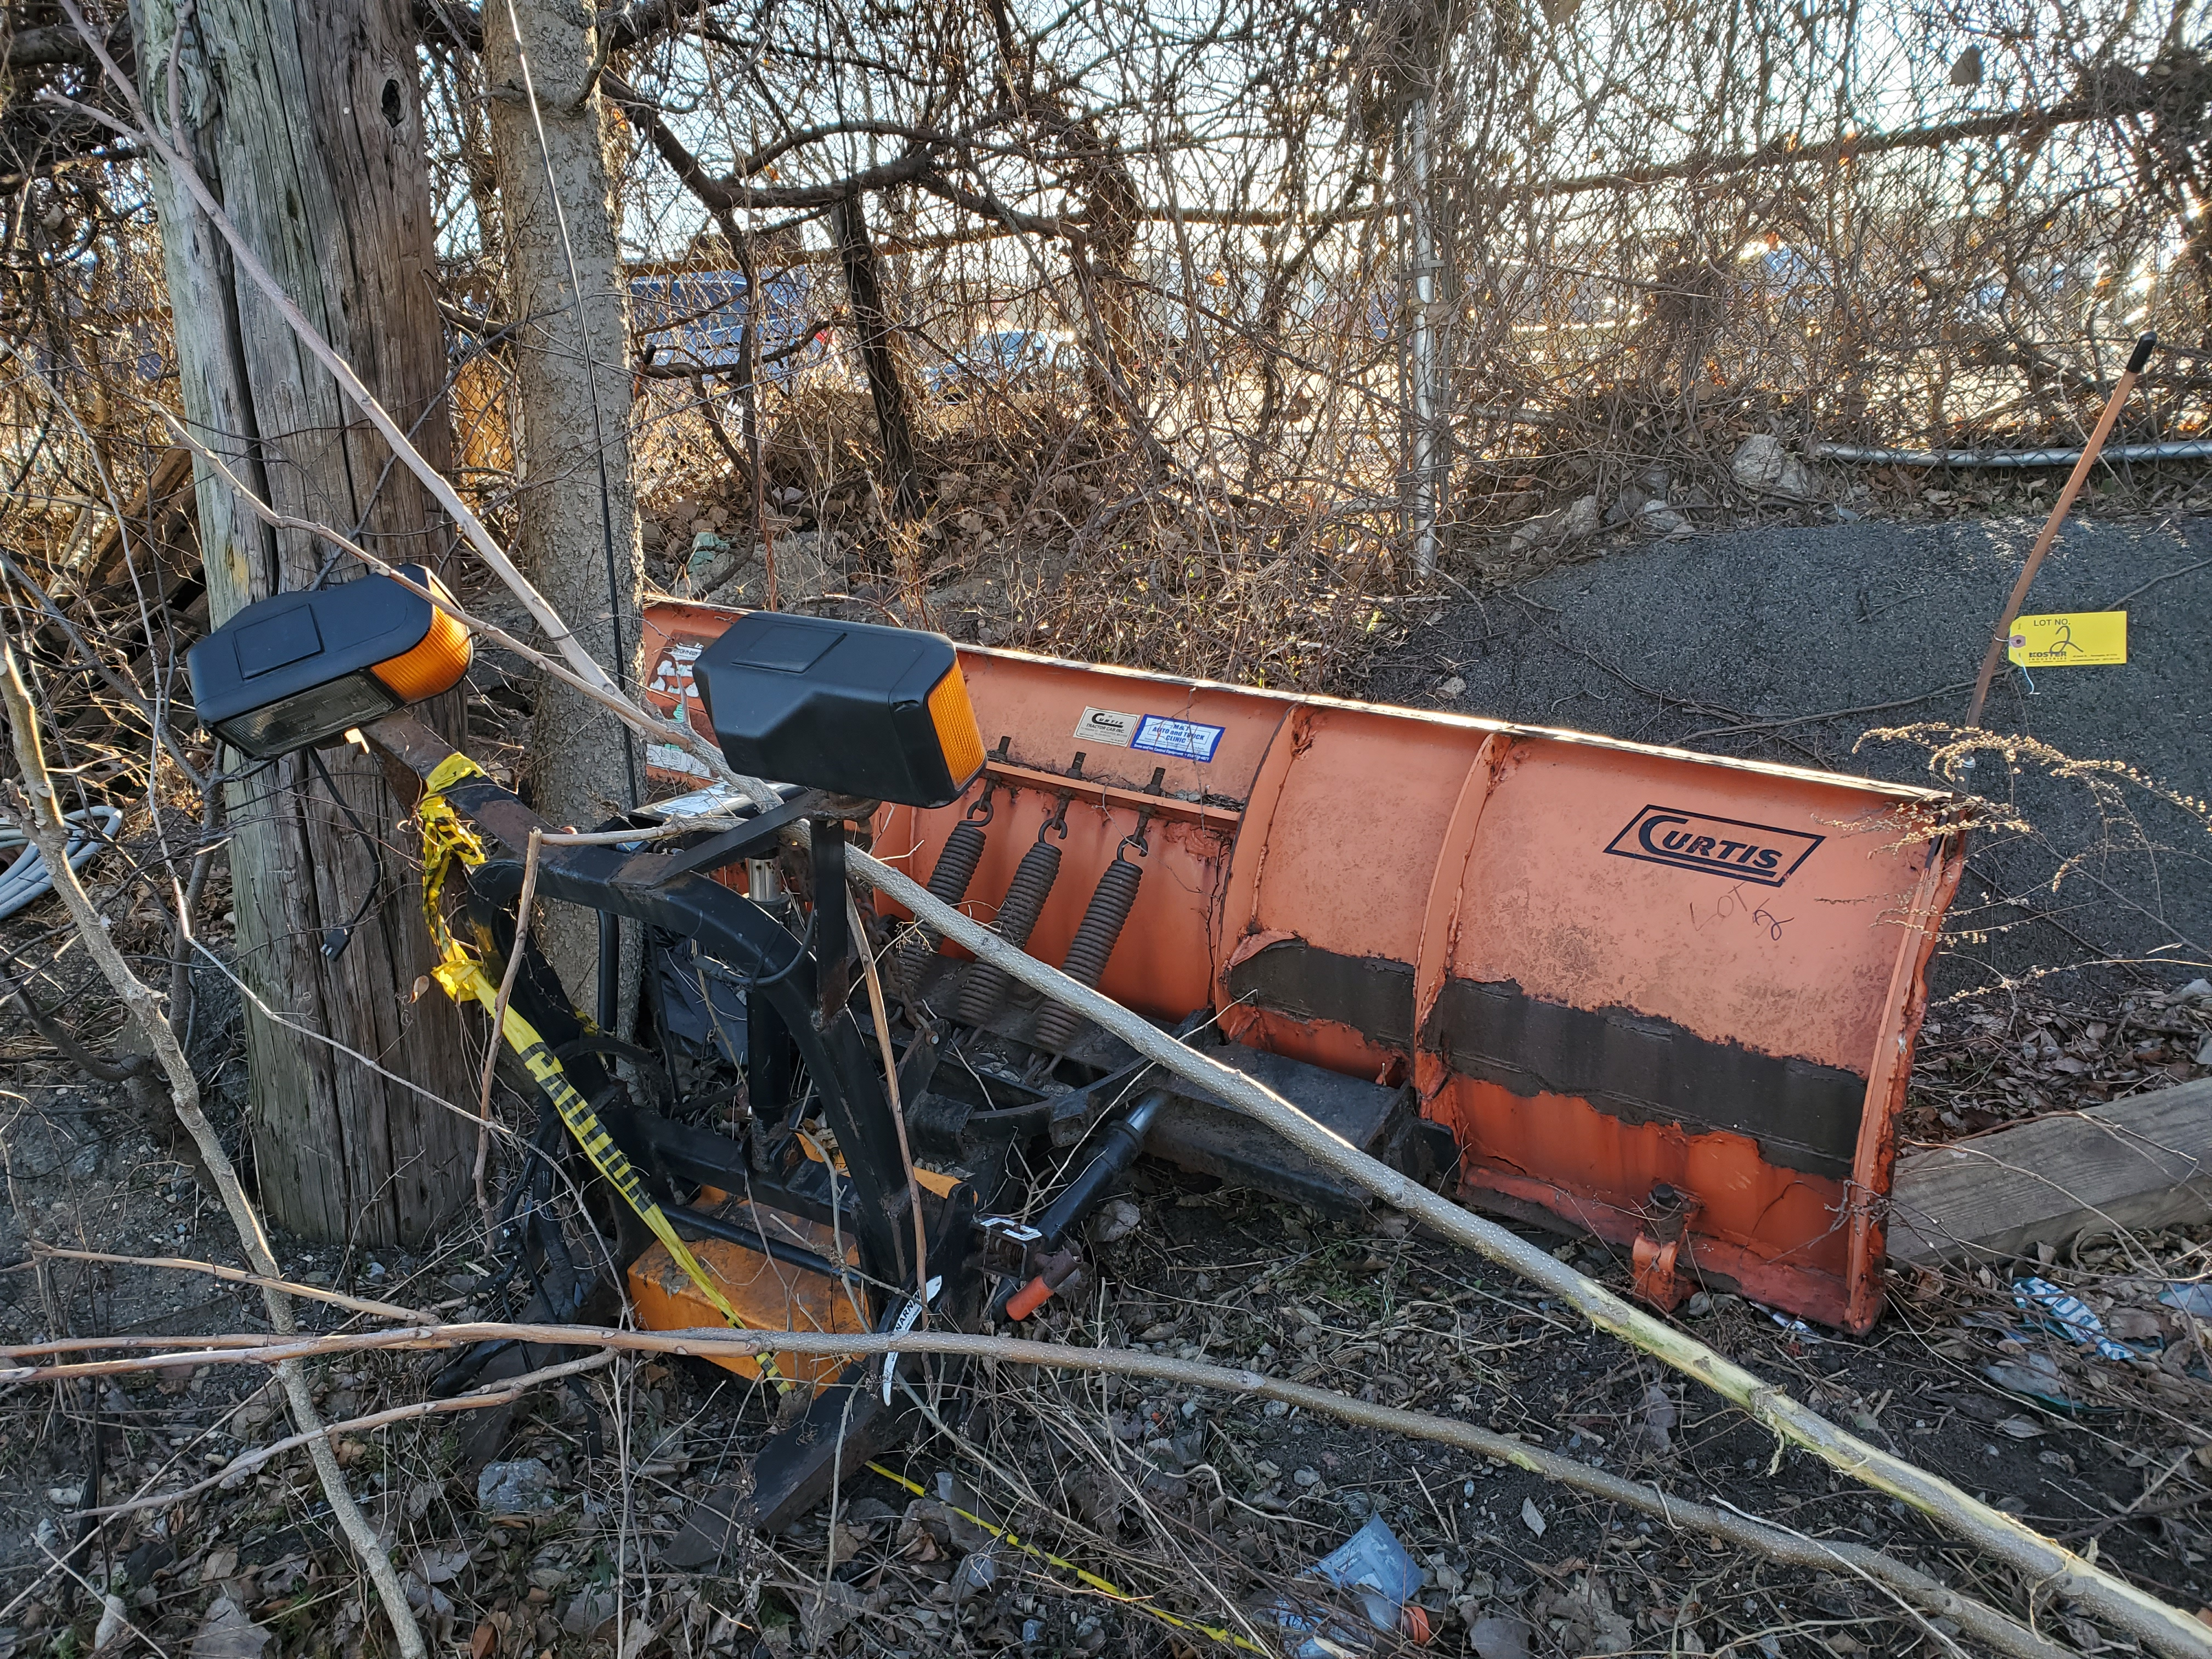 Lot 2 - 8' CURTIS SNOW PLOW ATTACHMENT [LOCATED @ KEM YARD - PELHAM MANOR, BRONX, NY]